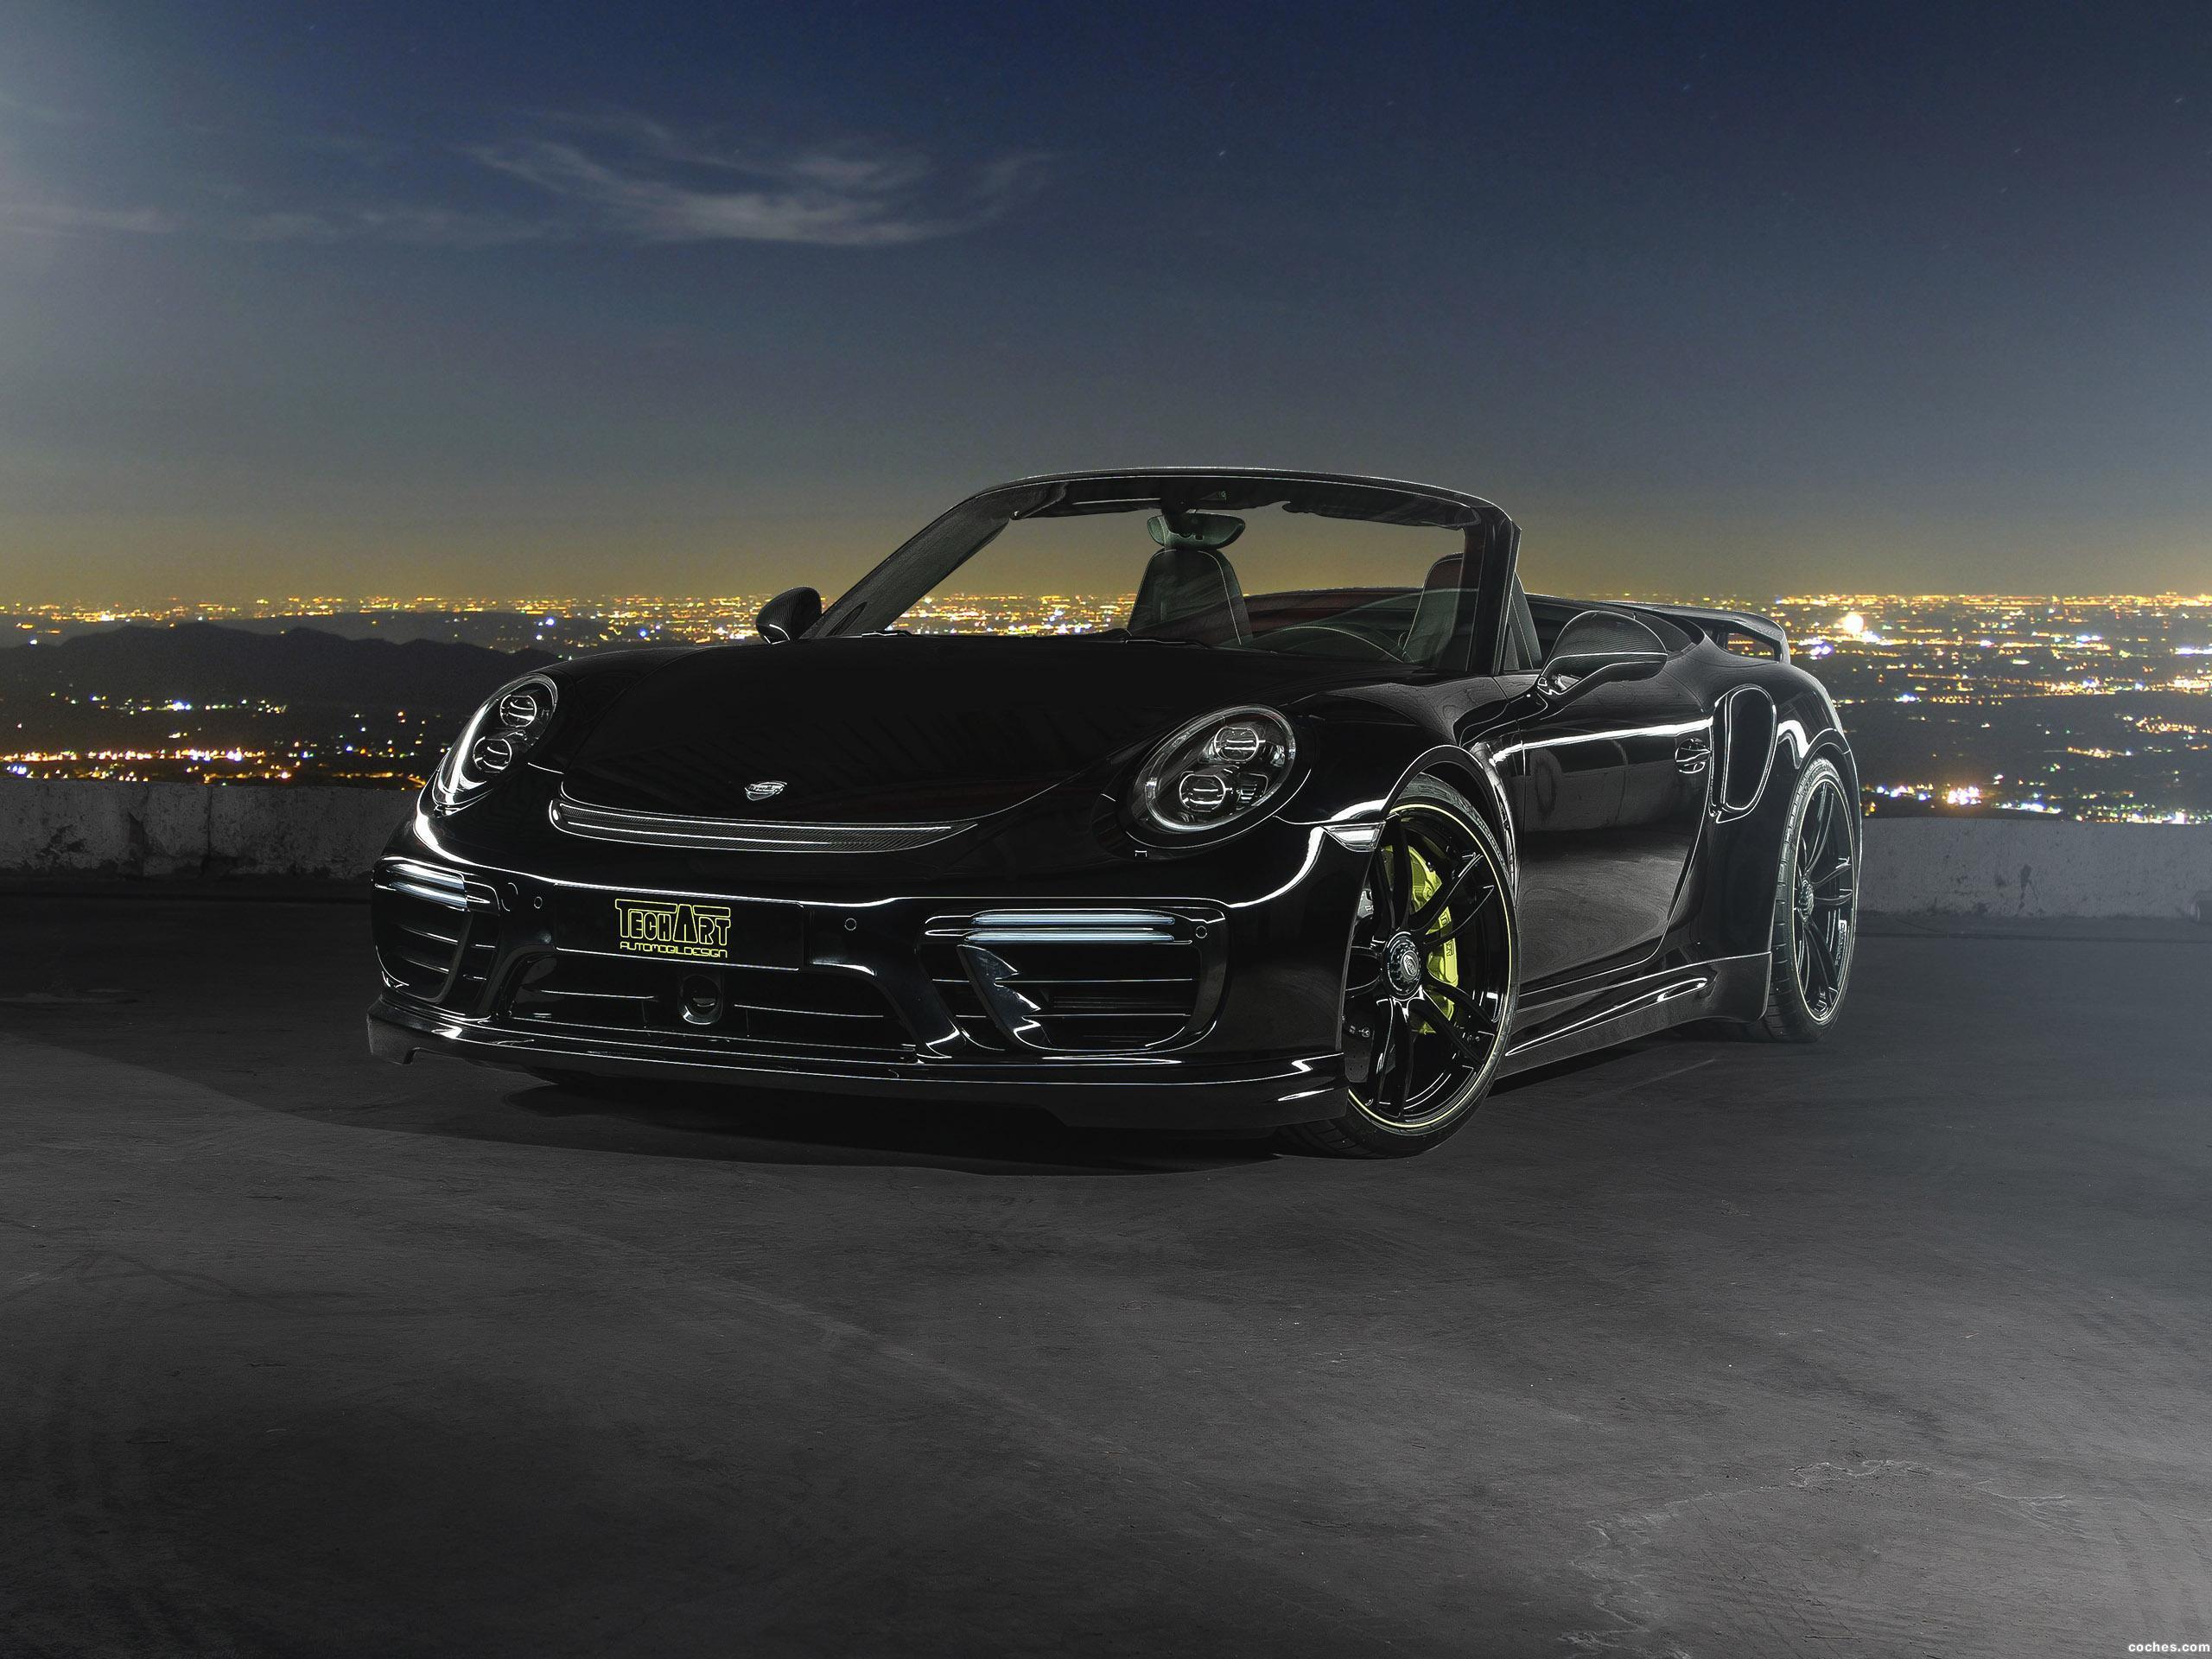 techart_porsche-911-turbo-cabriolet-991-2016_r8.jpg